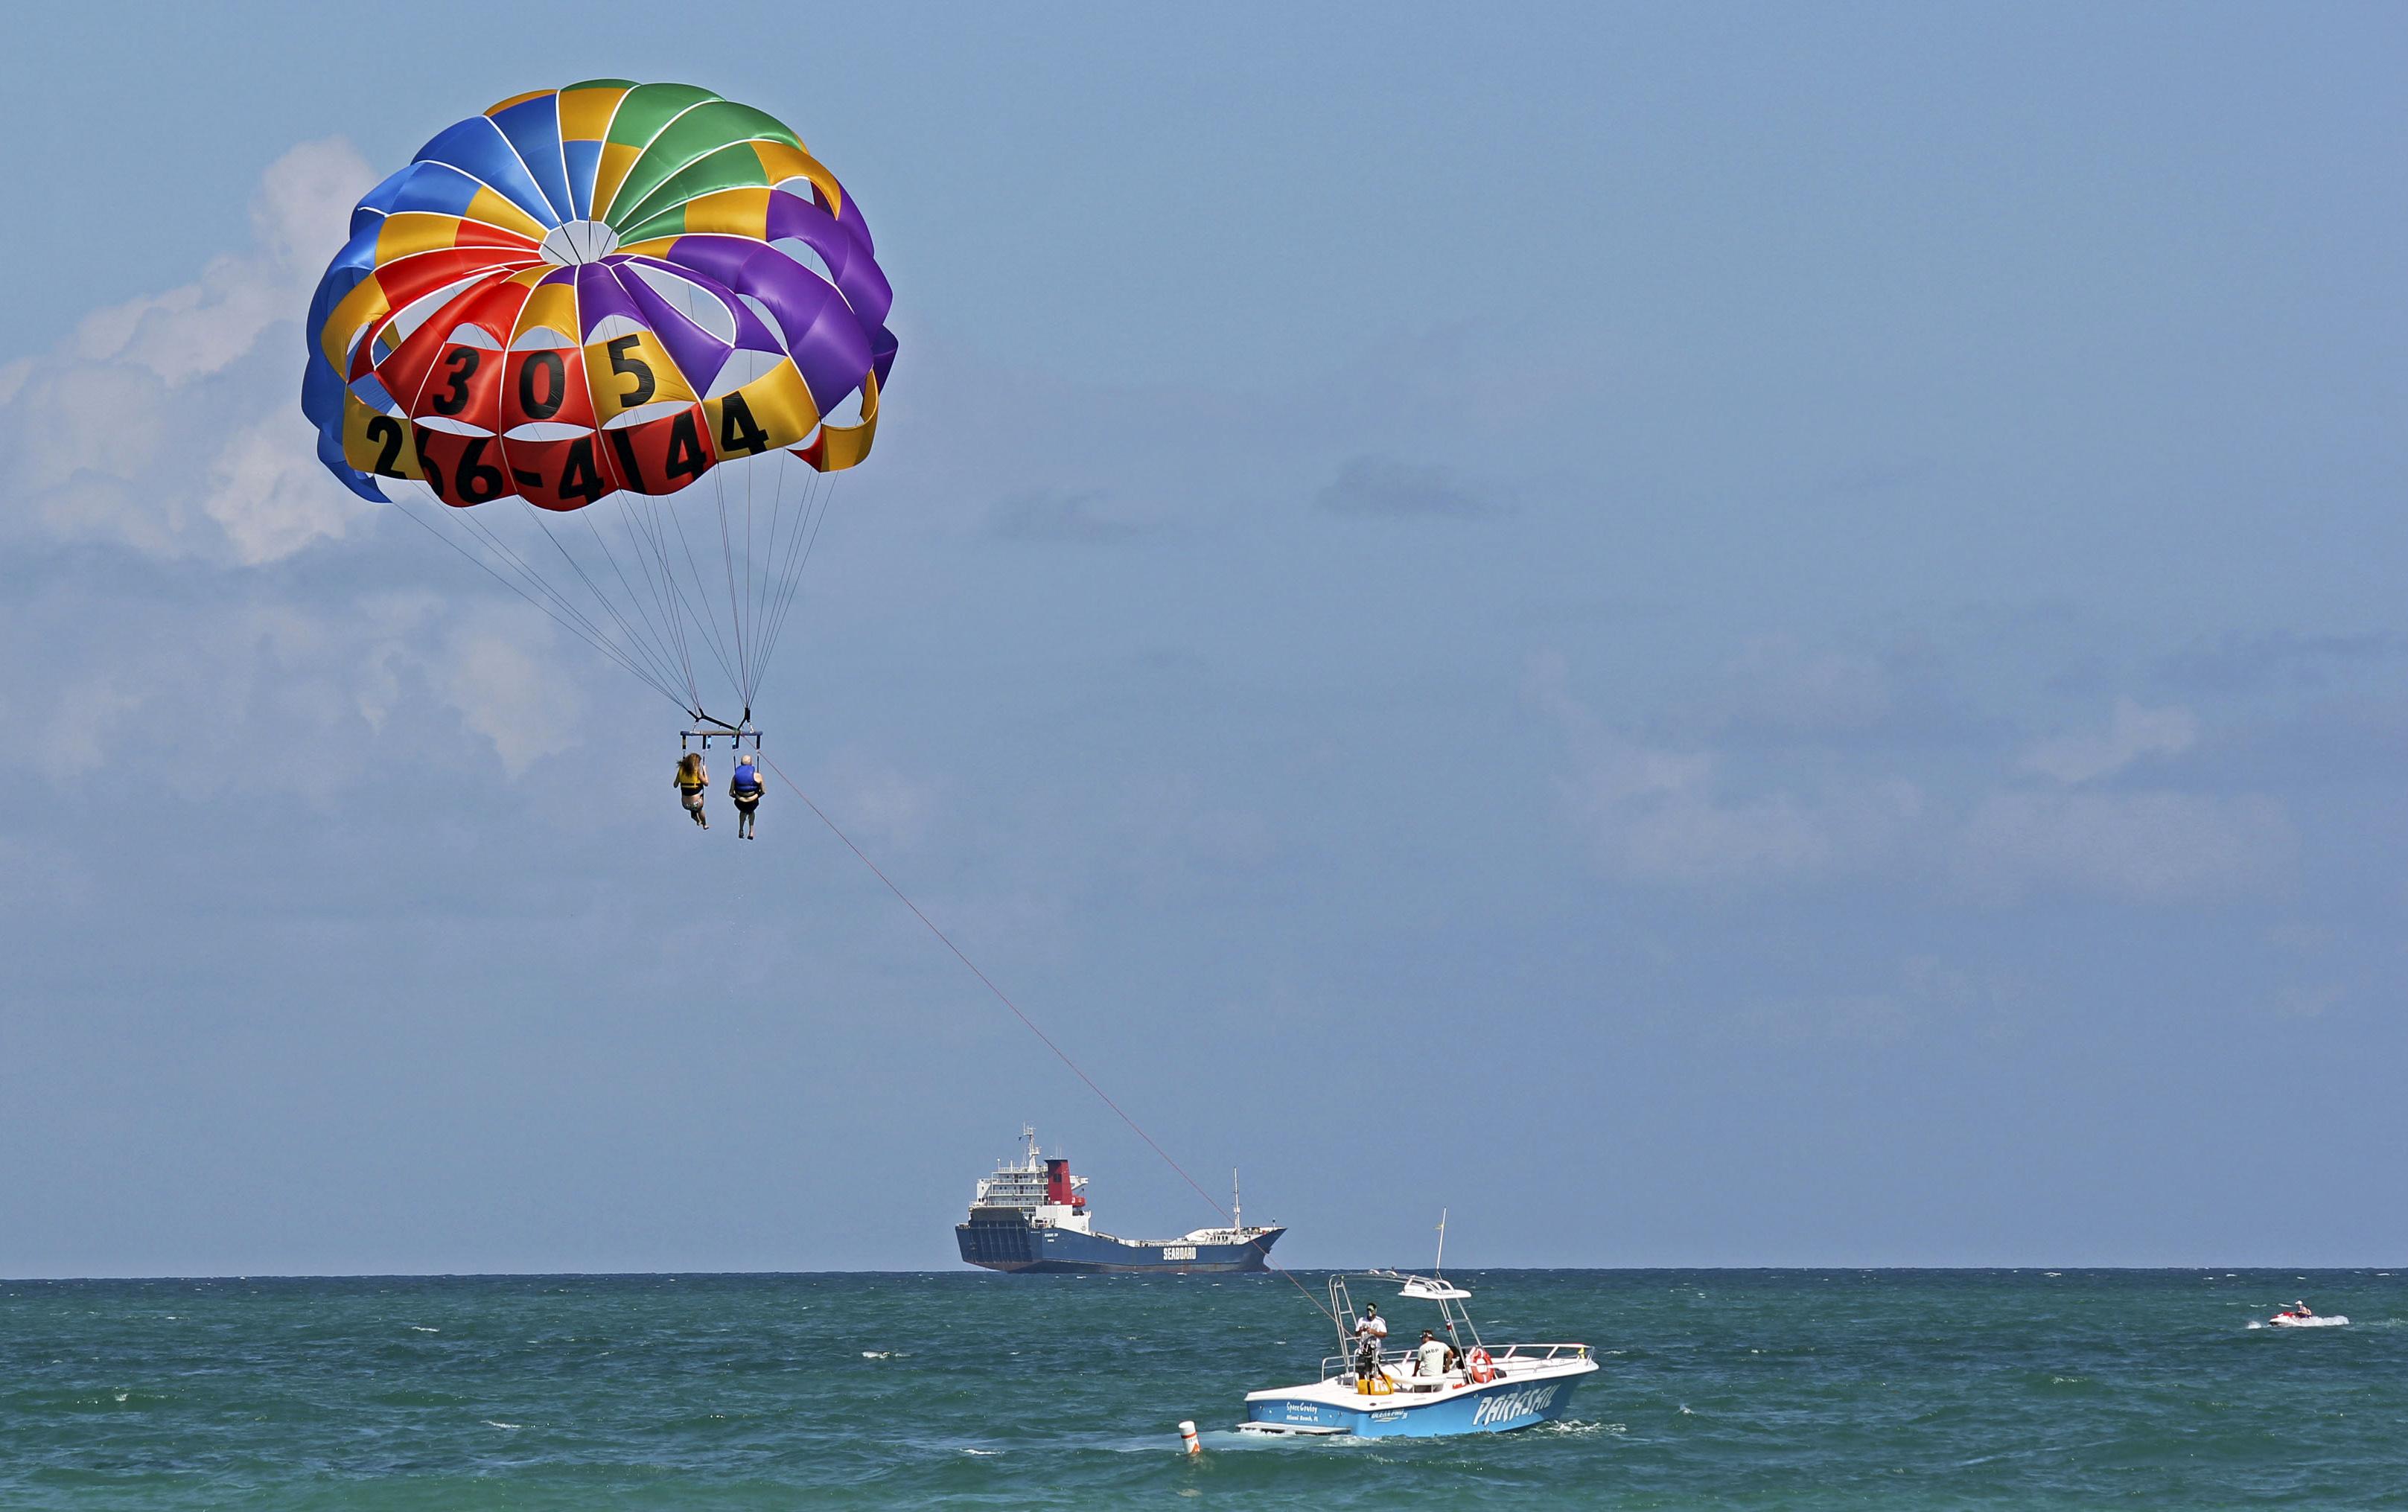 Panama City Beach Florida Parasailing Accident July